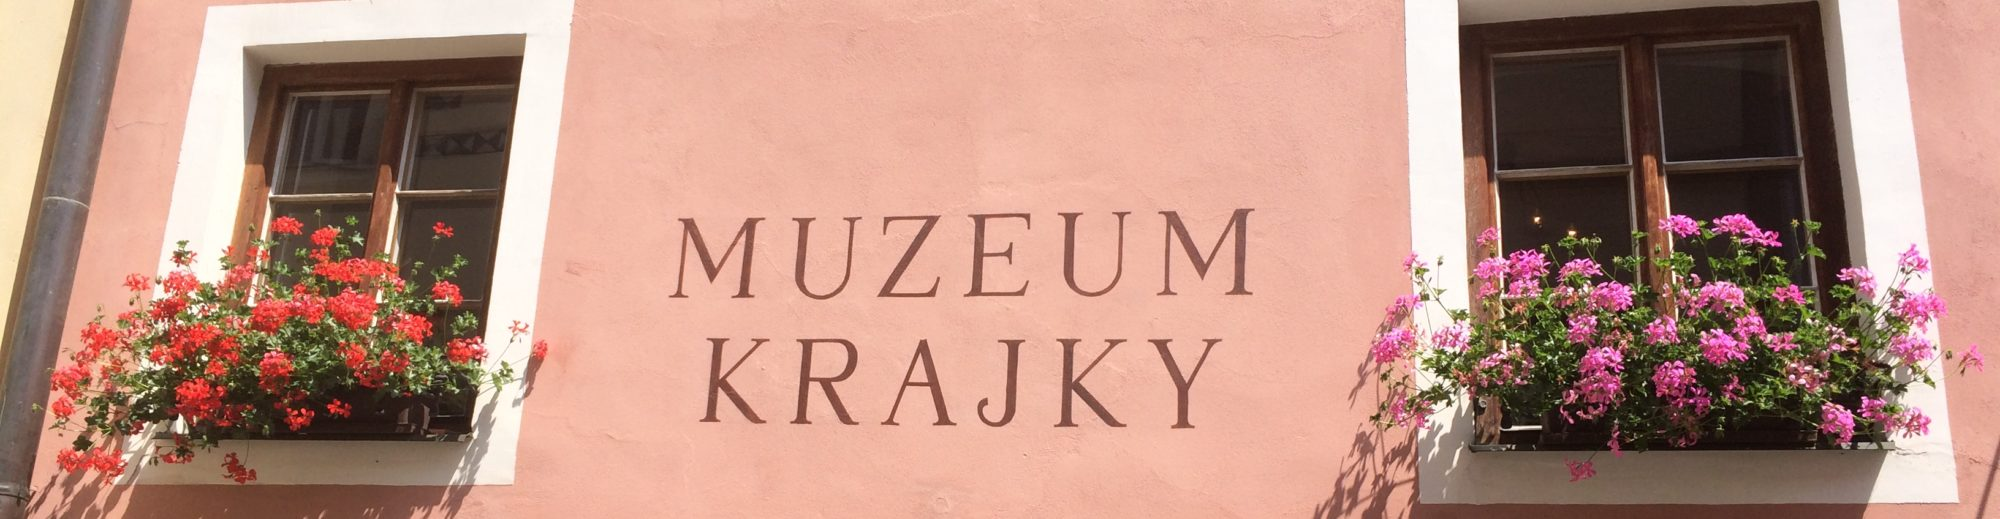 Muzeum krajky Prachatice